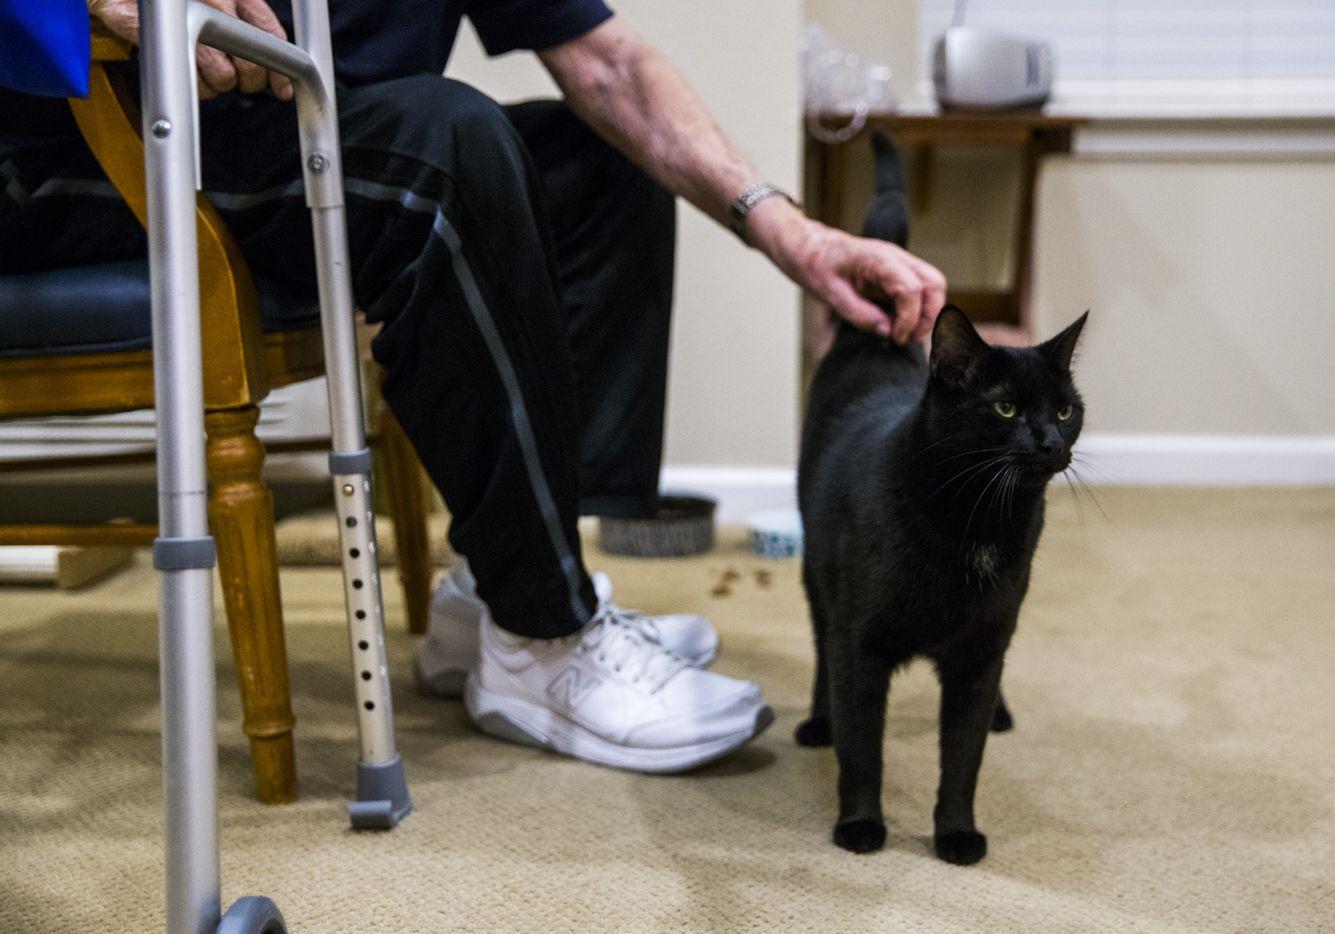 Bob Stiegler scratches Sammy the cat in his wife's room.